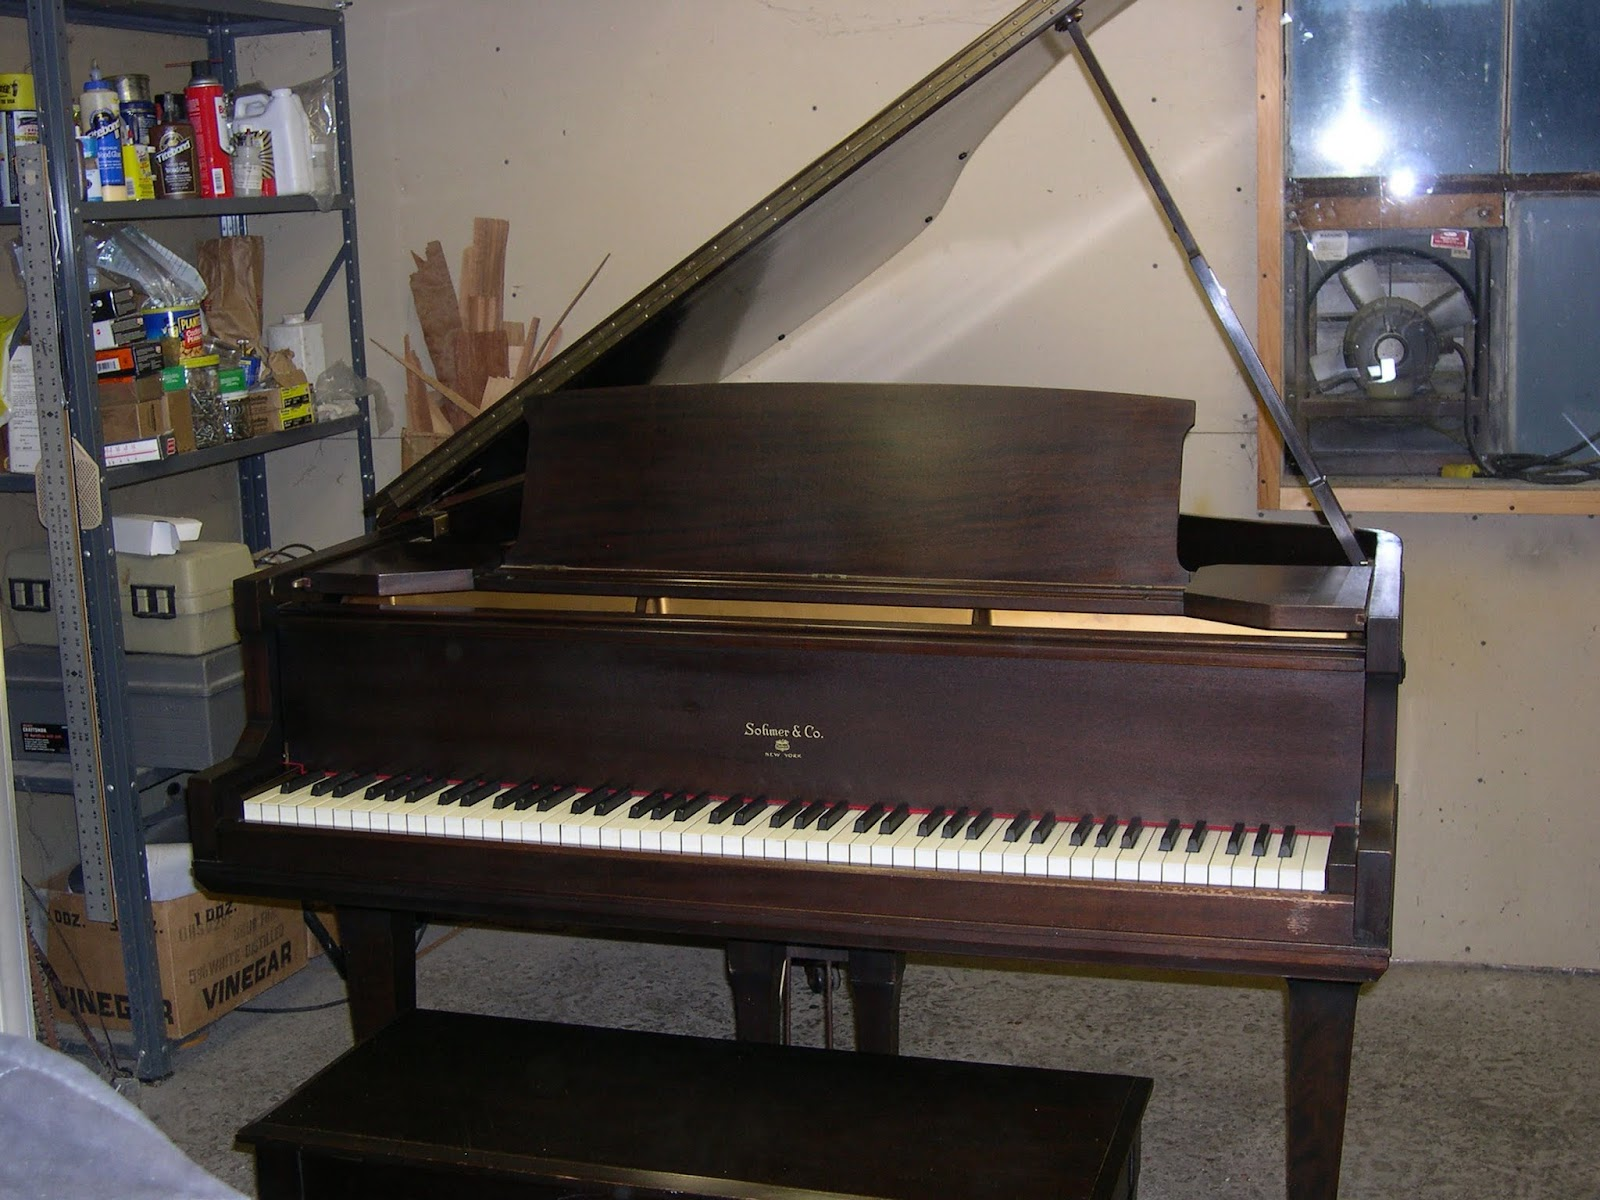 Cindy's Piano Studio: Sohmer & Co. Baby Grand for sale